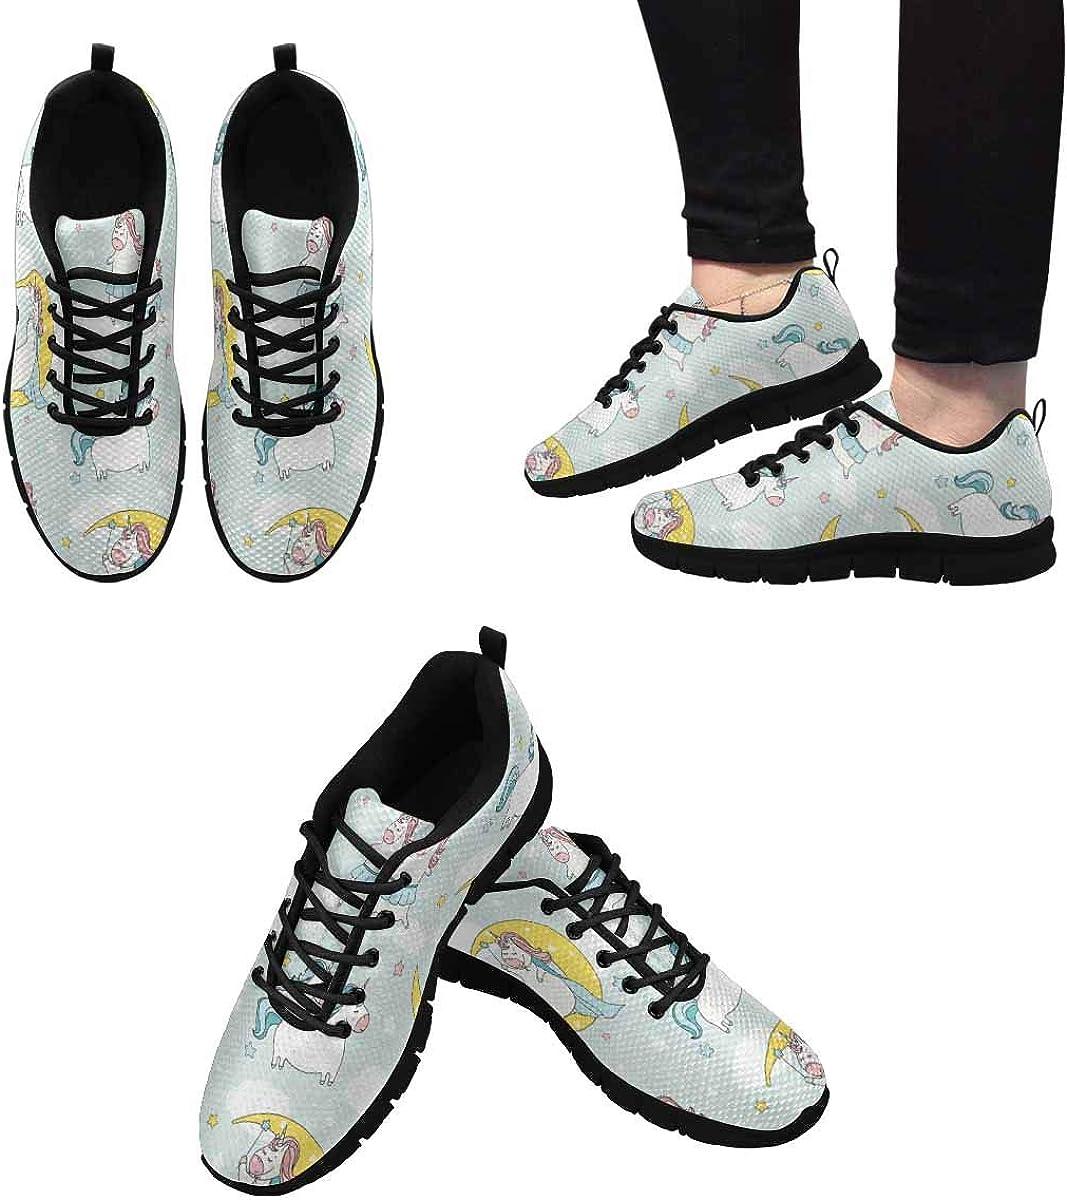 INTERESTPRINT Cartoon Cute Unicorn Women's Athletic Walking Shoes Casual Mesh Comfortable Work Sneakers